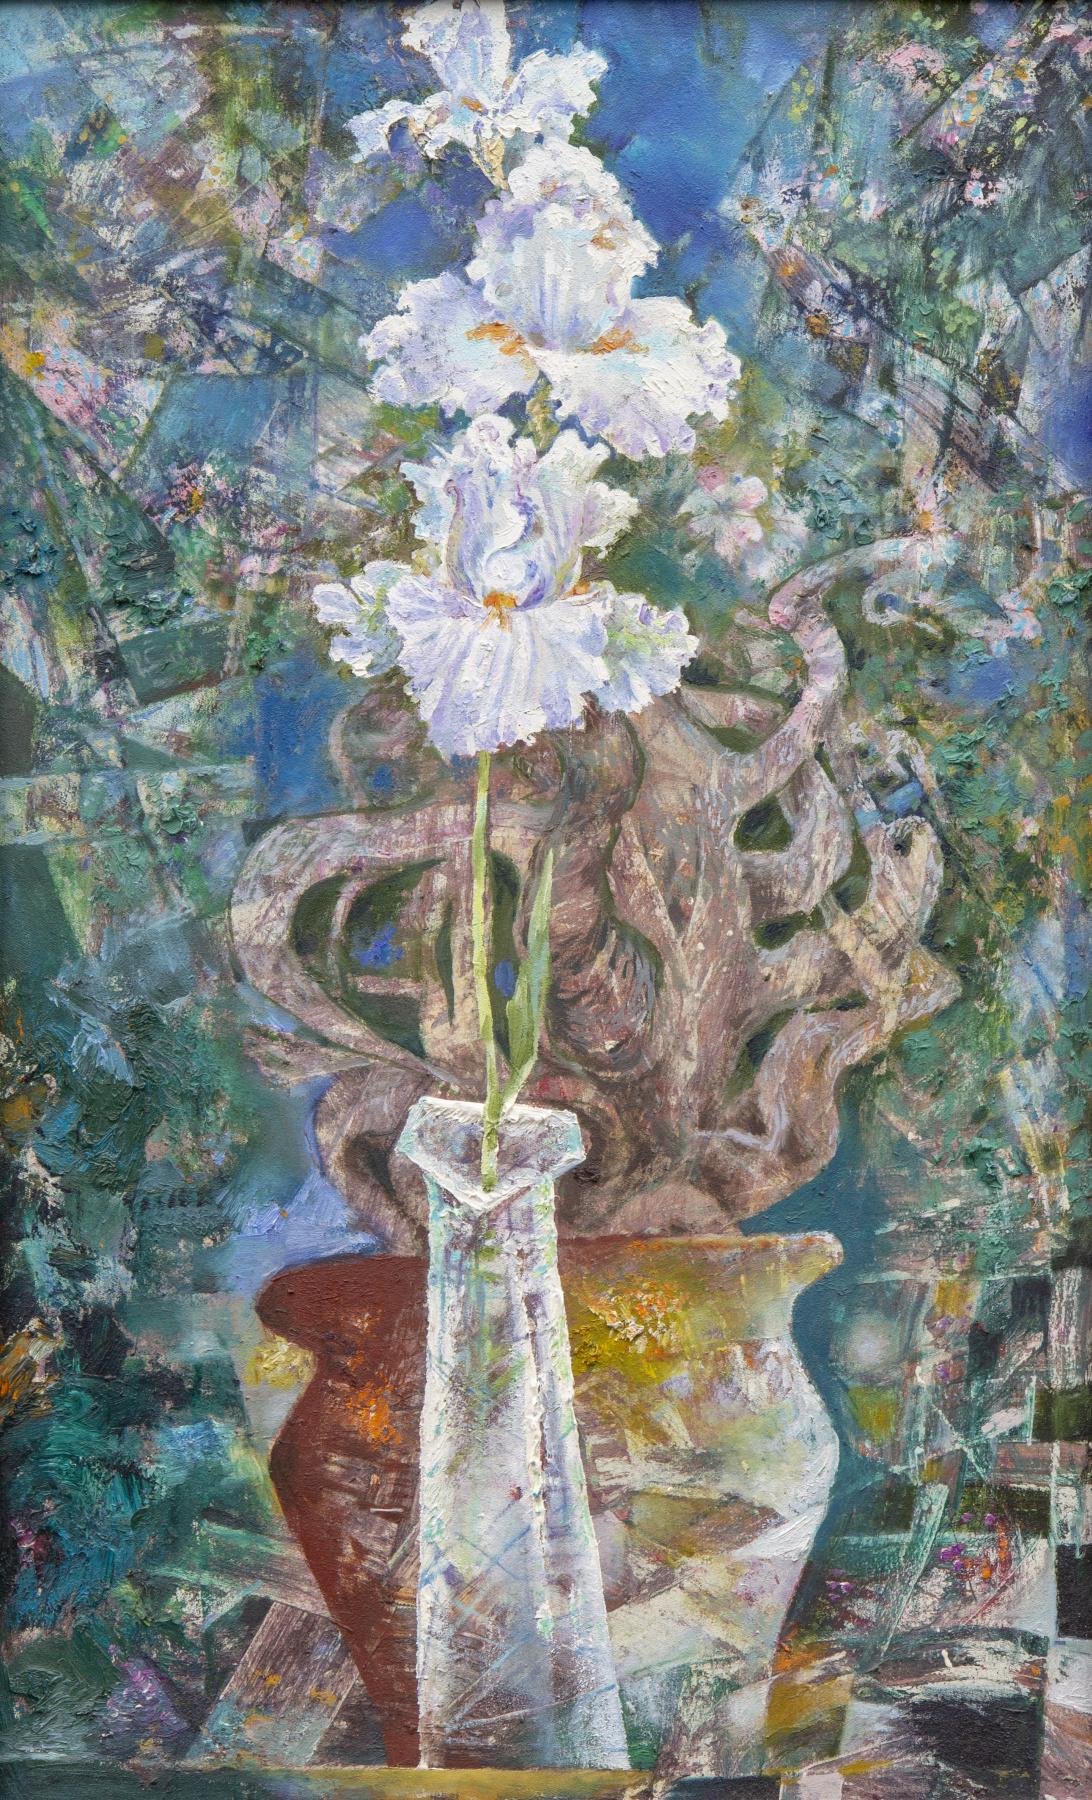 Rinat Salimzyanovich Khanafeev. Iris